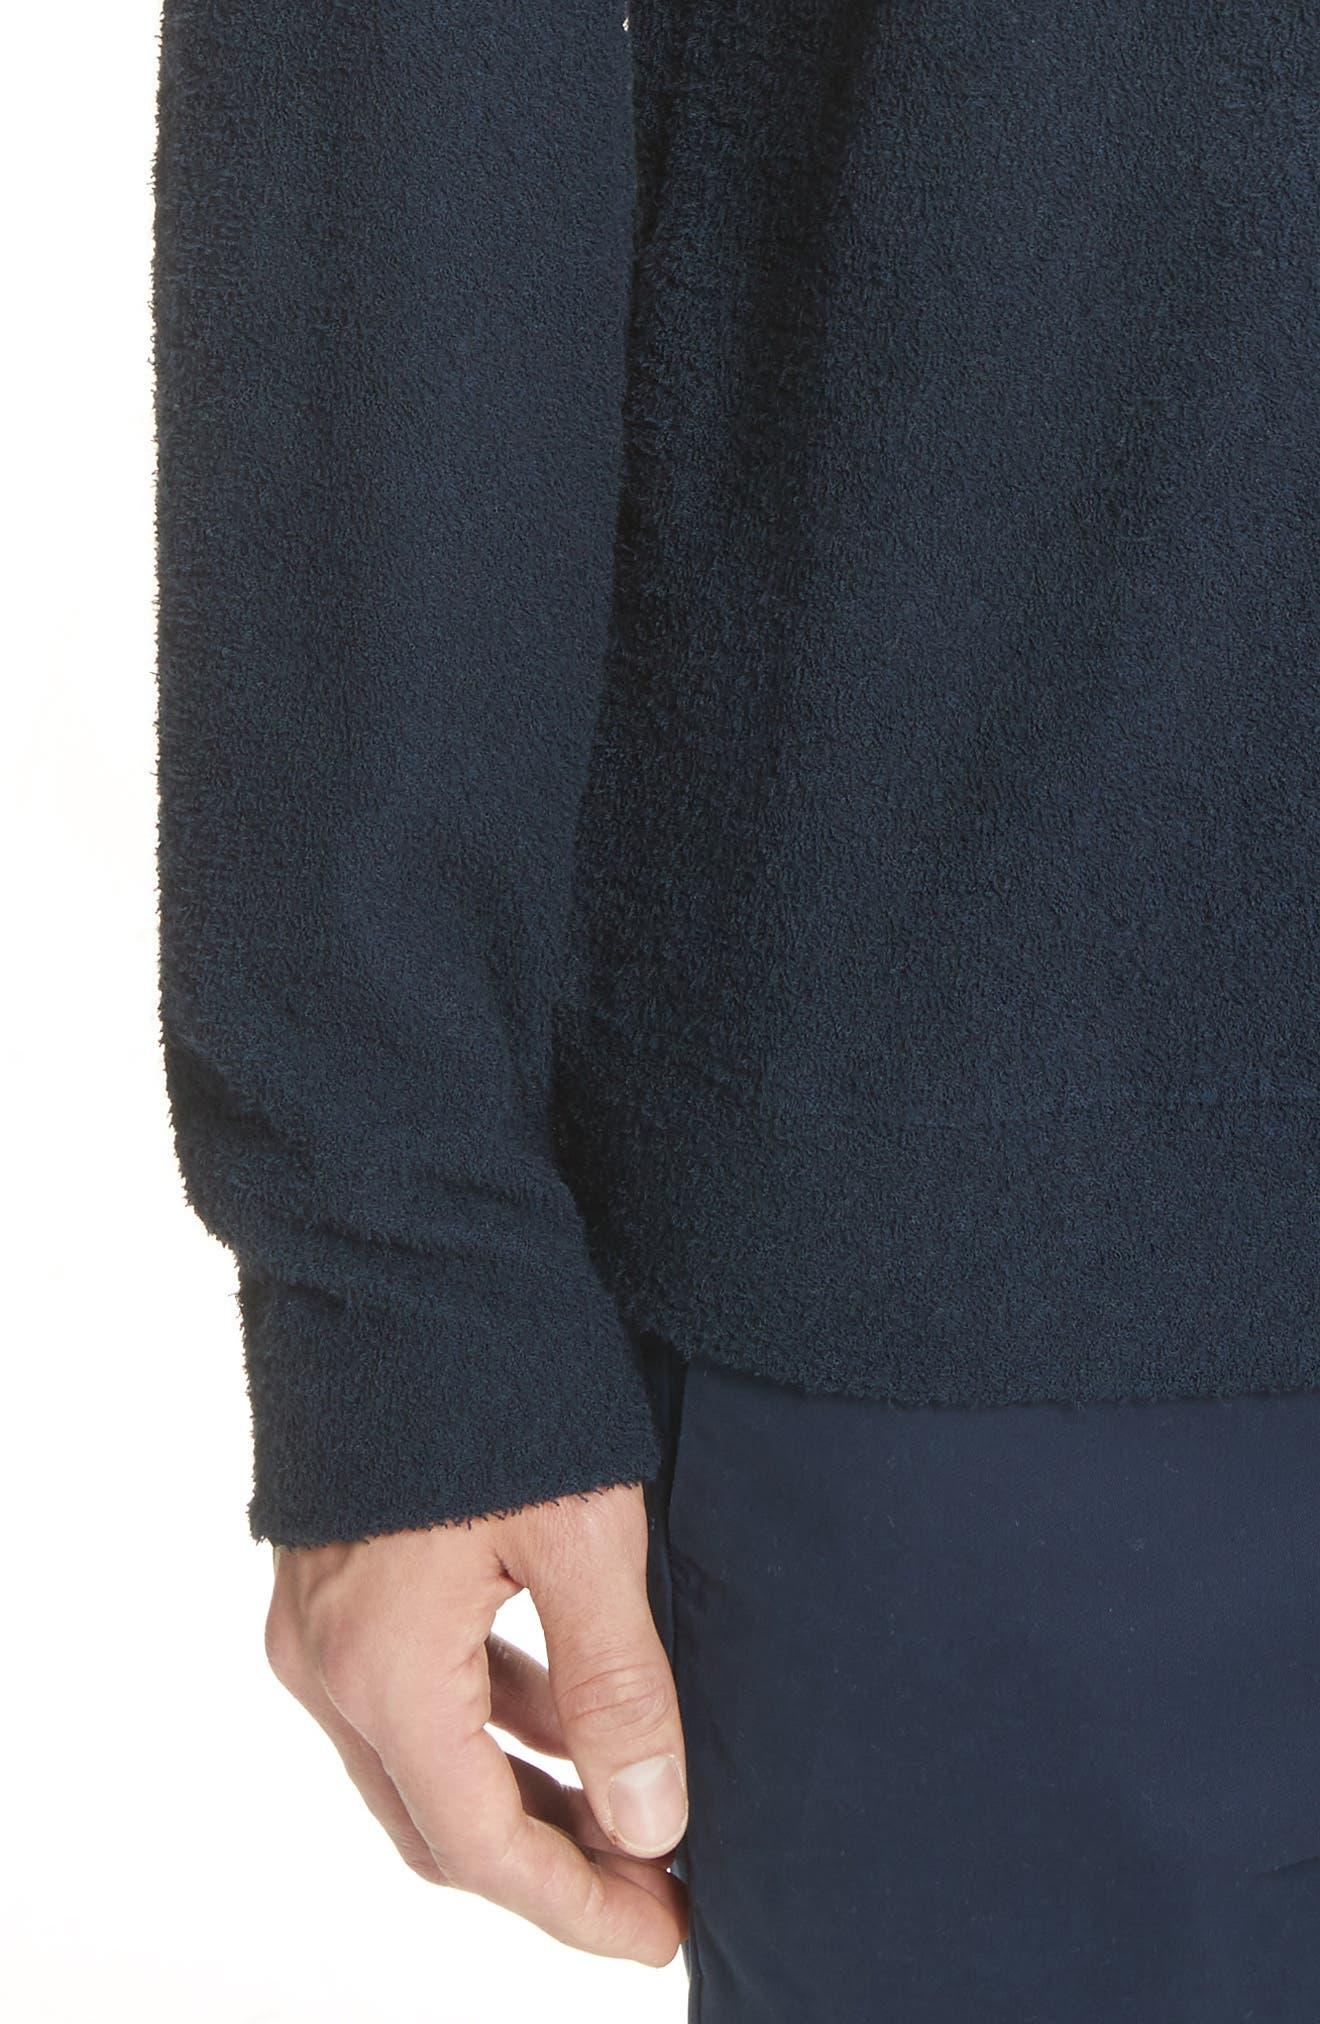 Rask Crewneck Sweatshirt,                             Alternate thumbnail 4, color,                             Dark Navy